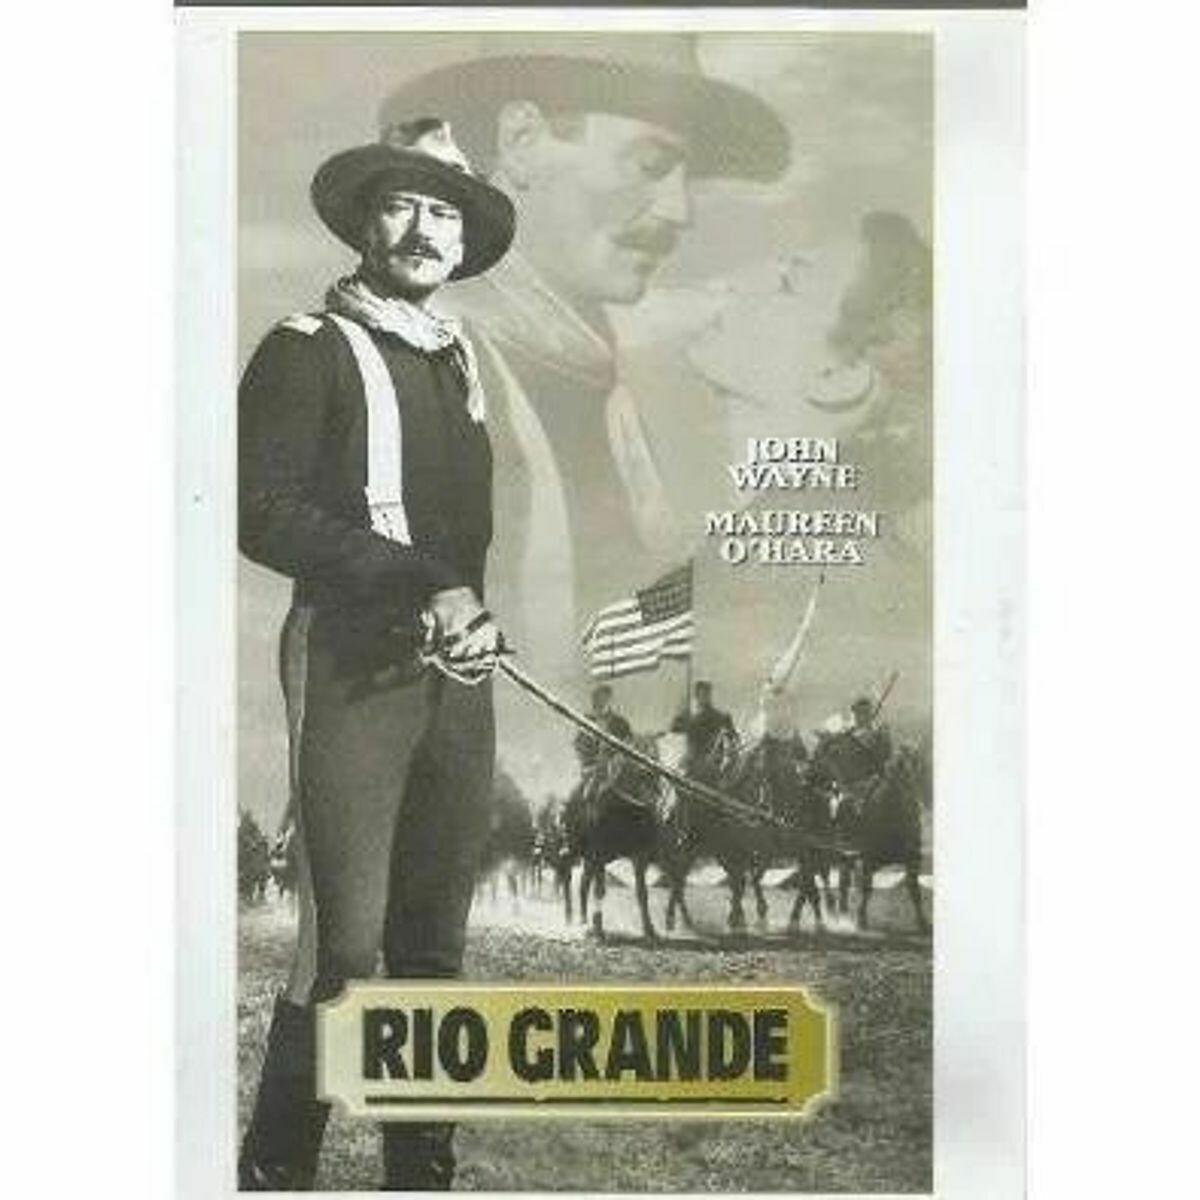 RIO GRANDE - DVD